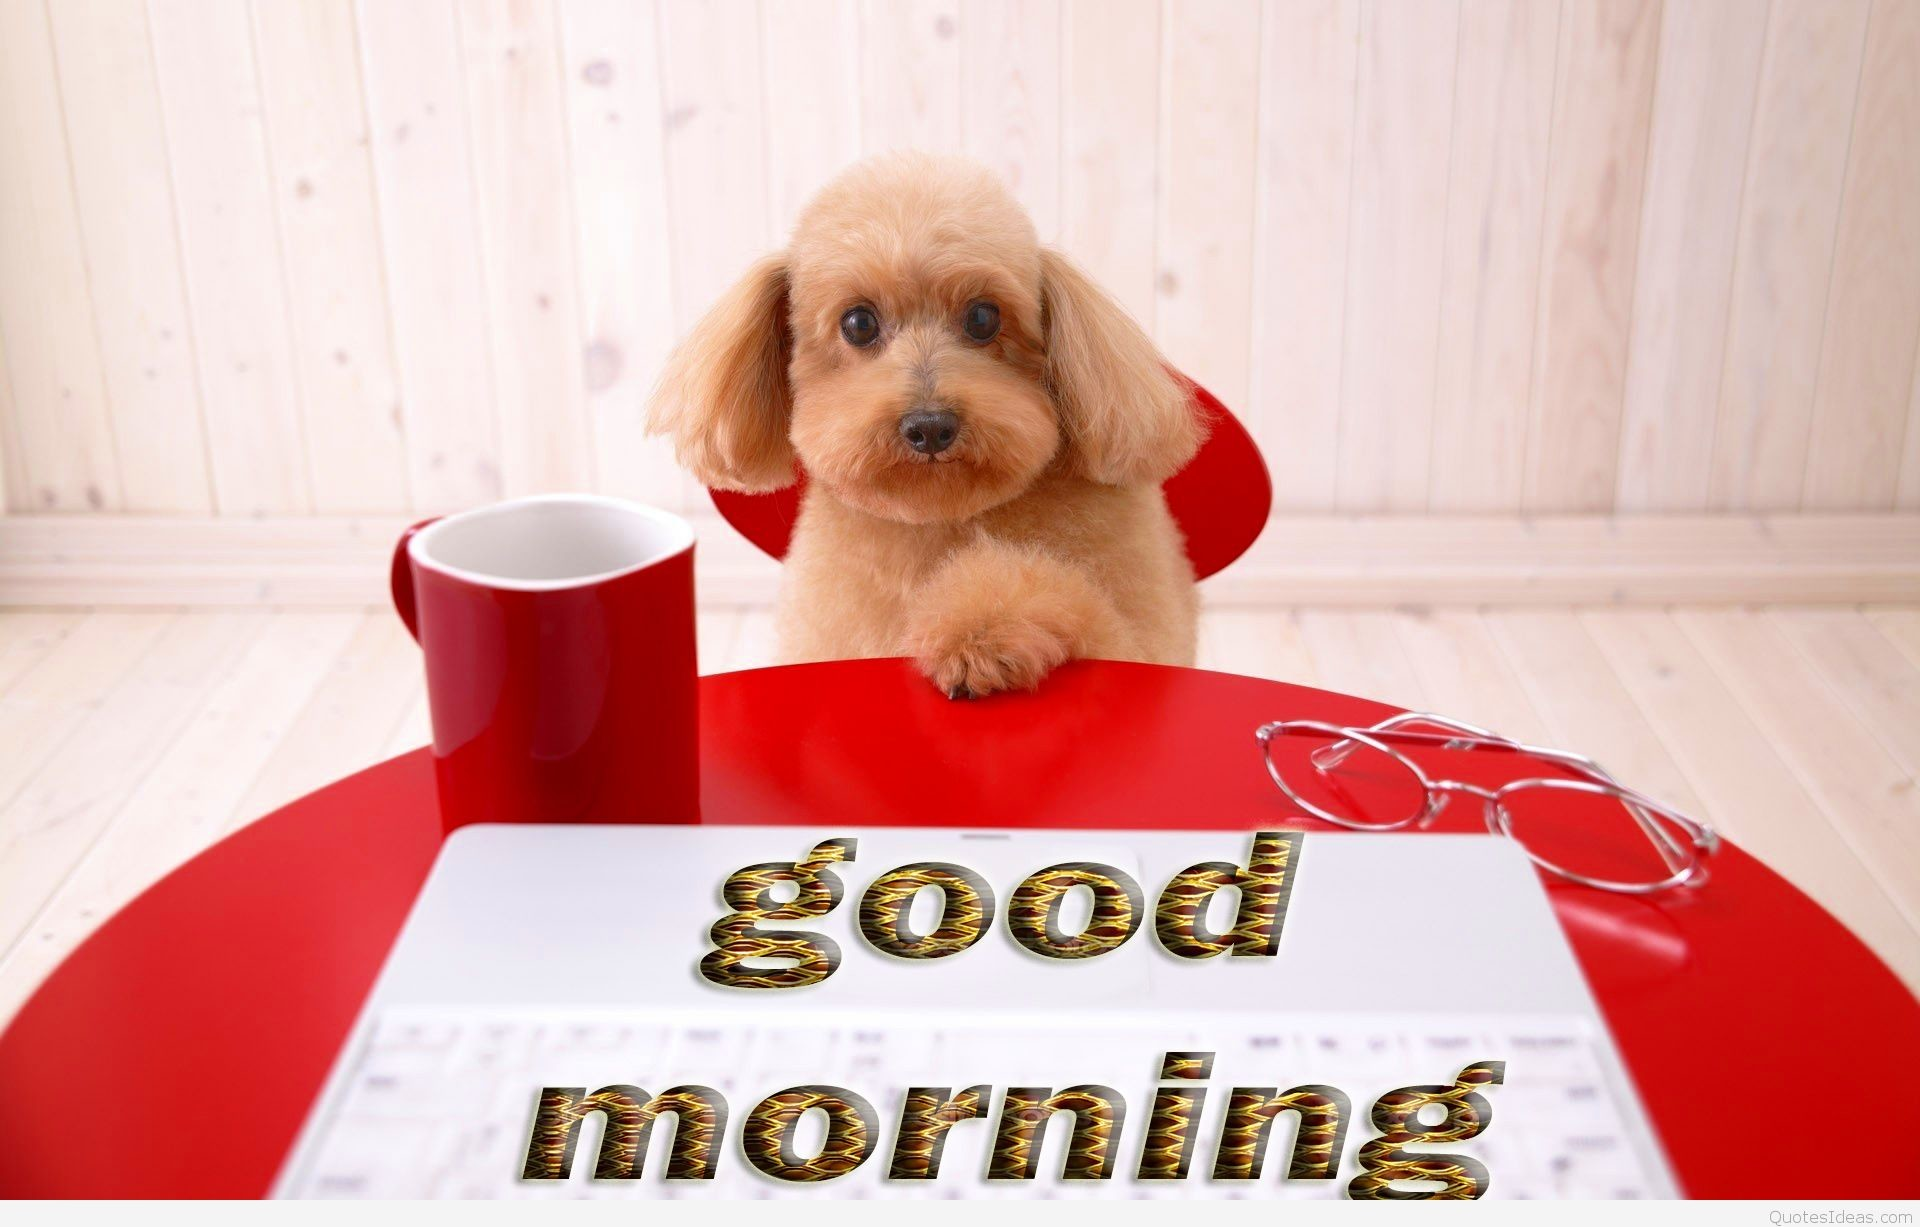 Good-Morning-Tea-cup-dog-Wallpapers